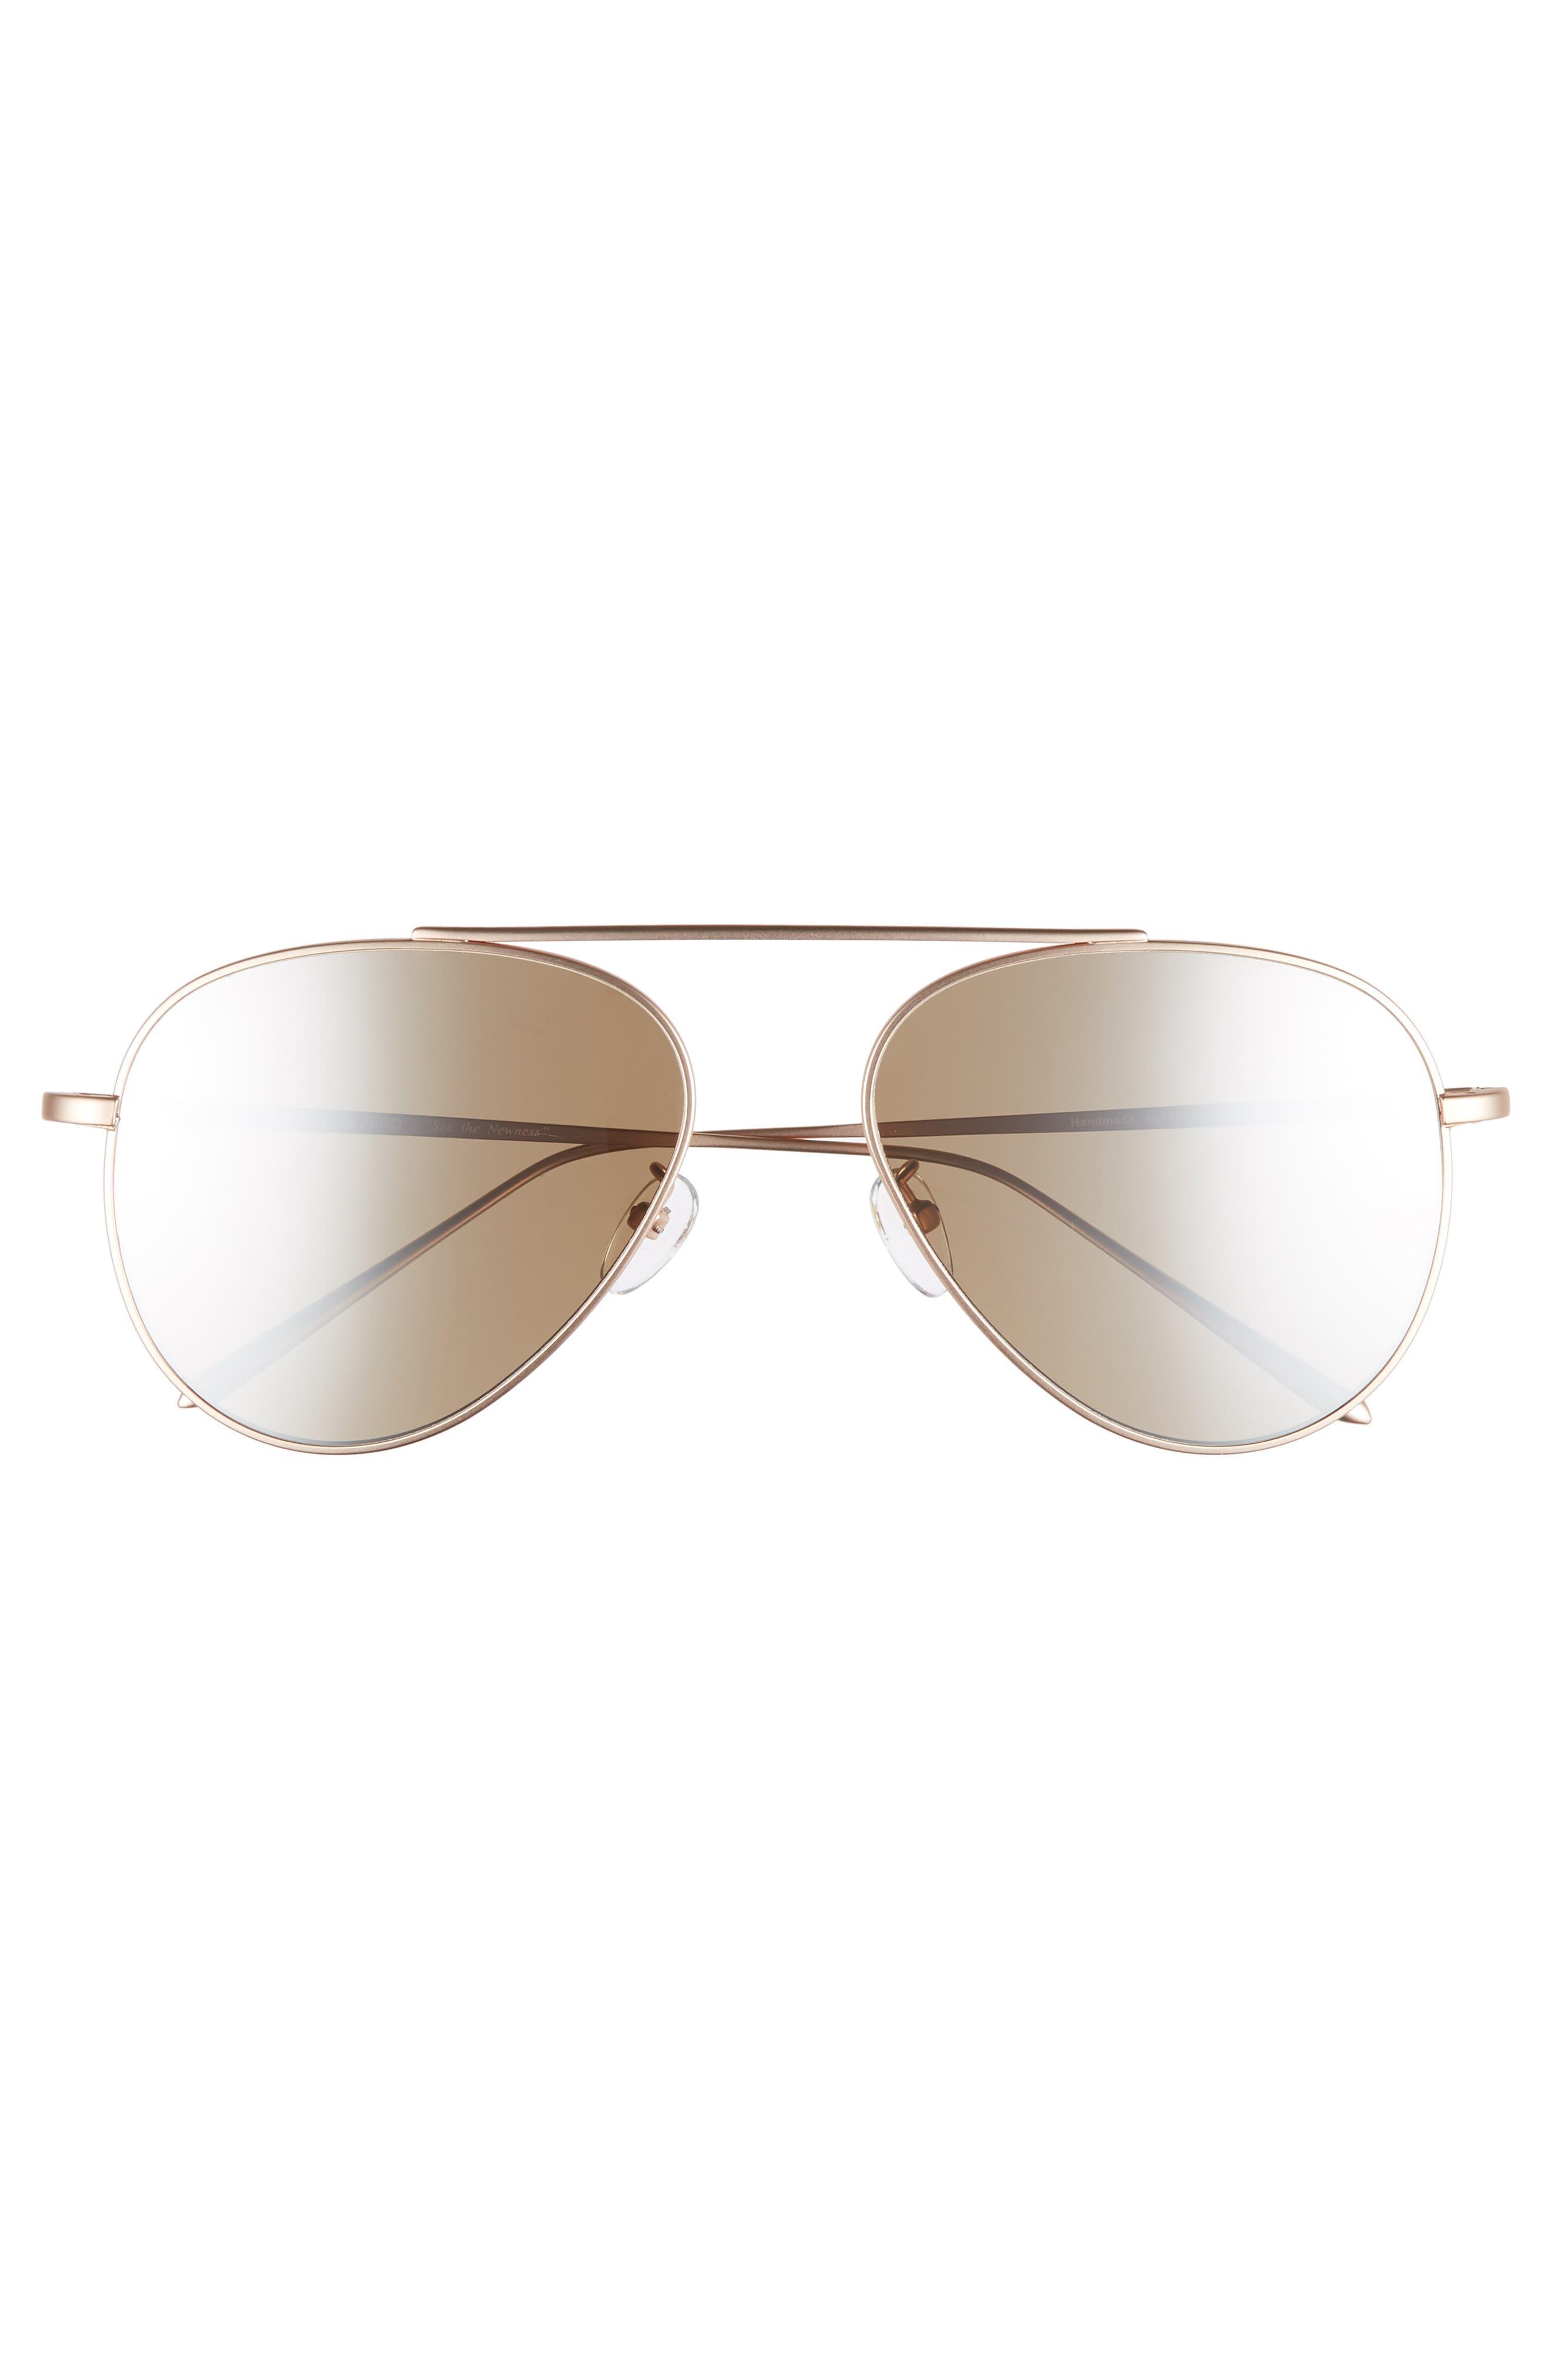 59mm Metal Aviator Sunglasses,                             Alternate thumbnail 3, color,                             ROSE GOLD/GOLD MIRROR